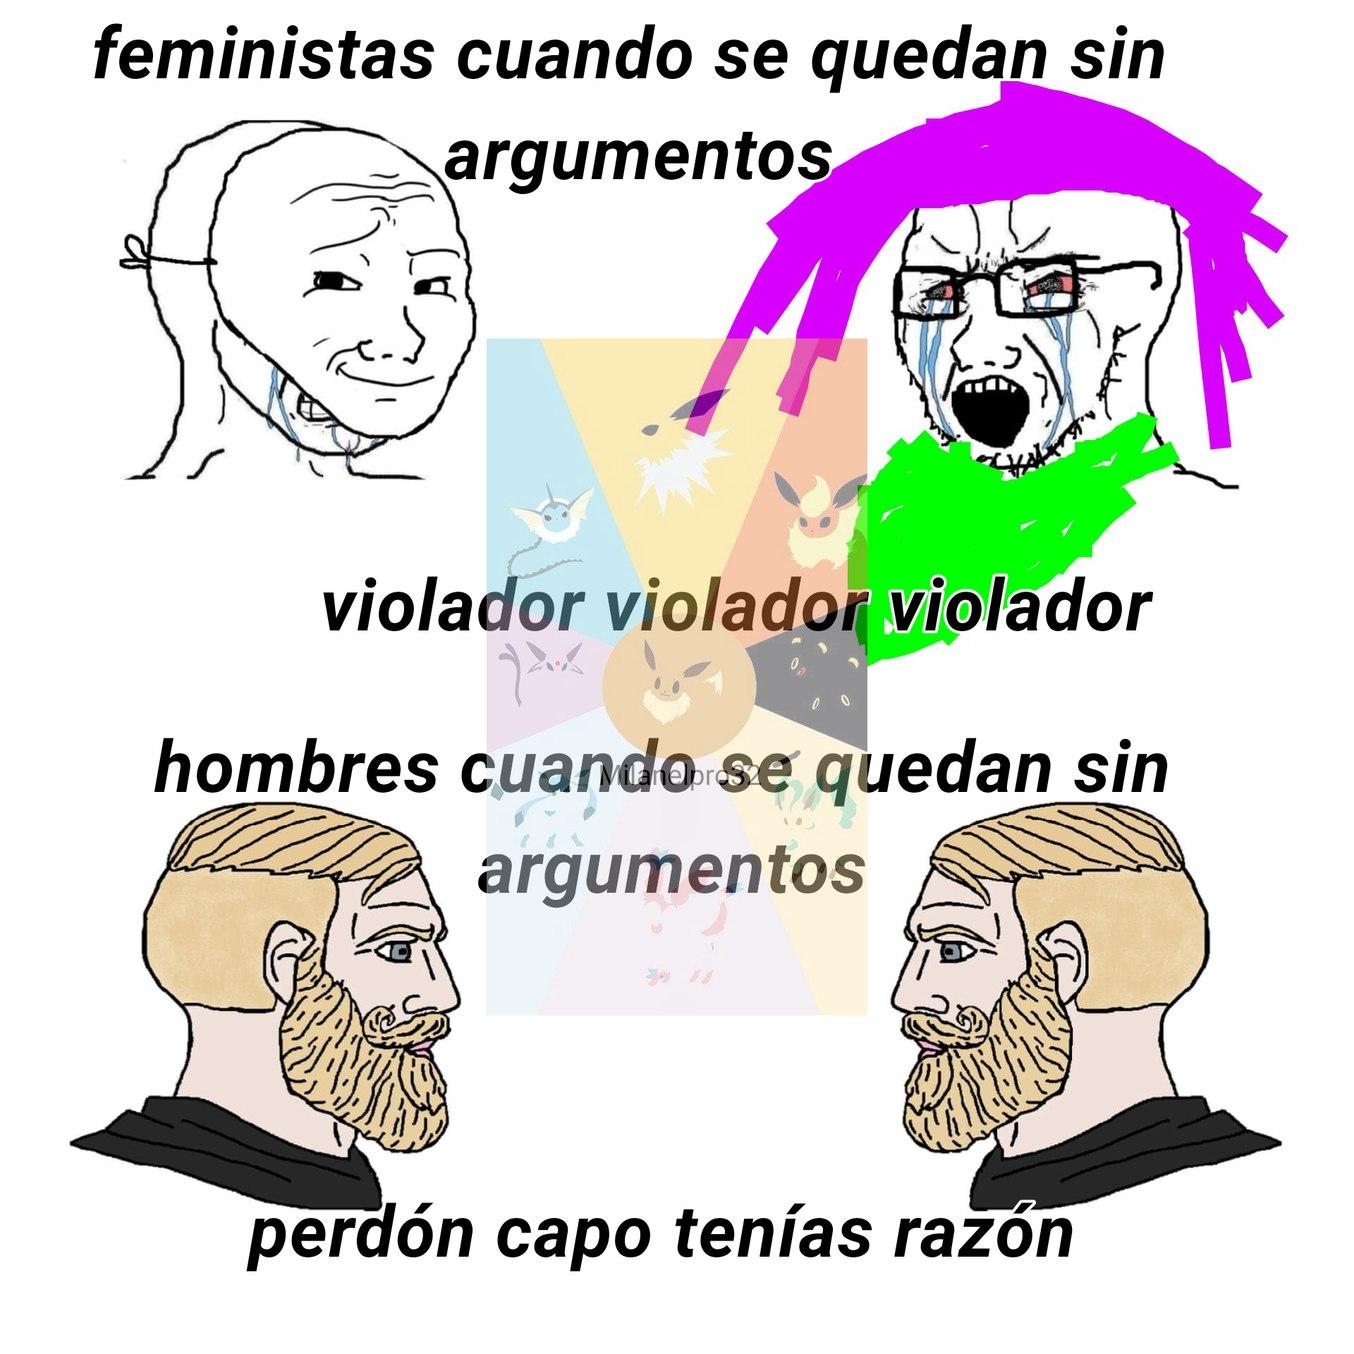 Ojalá no lo vea ninguna feminista - meme